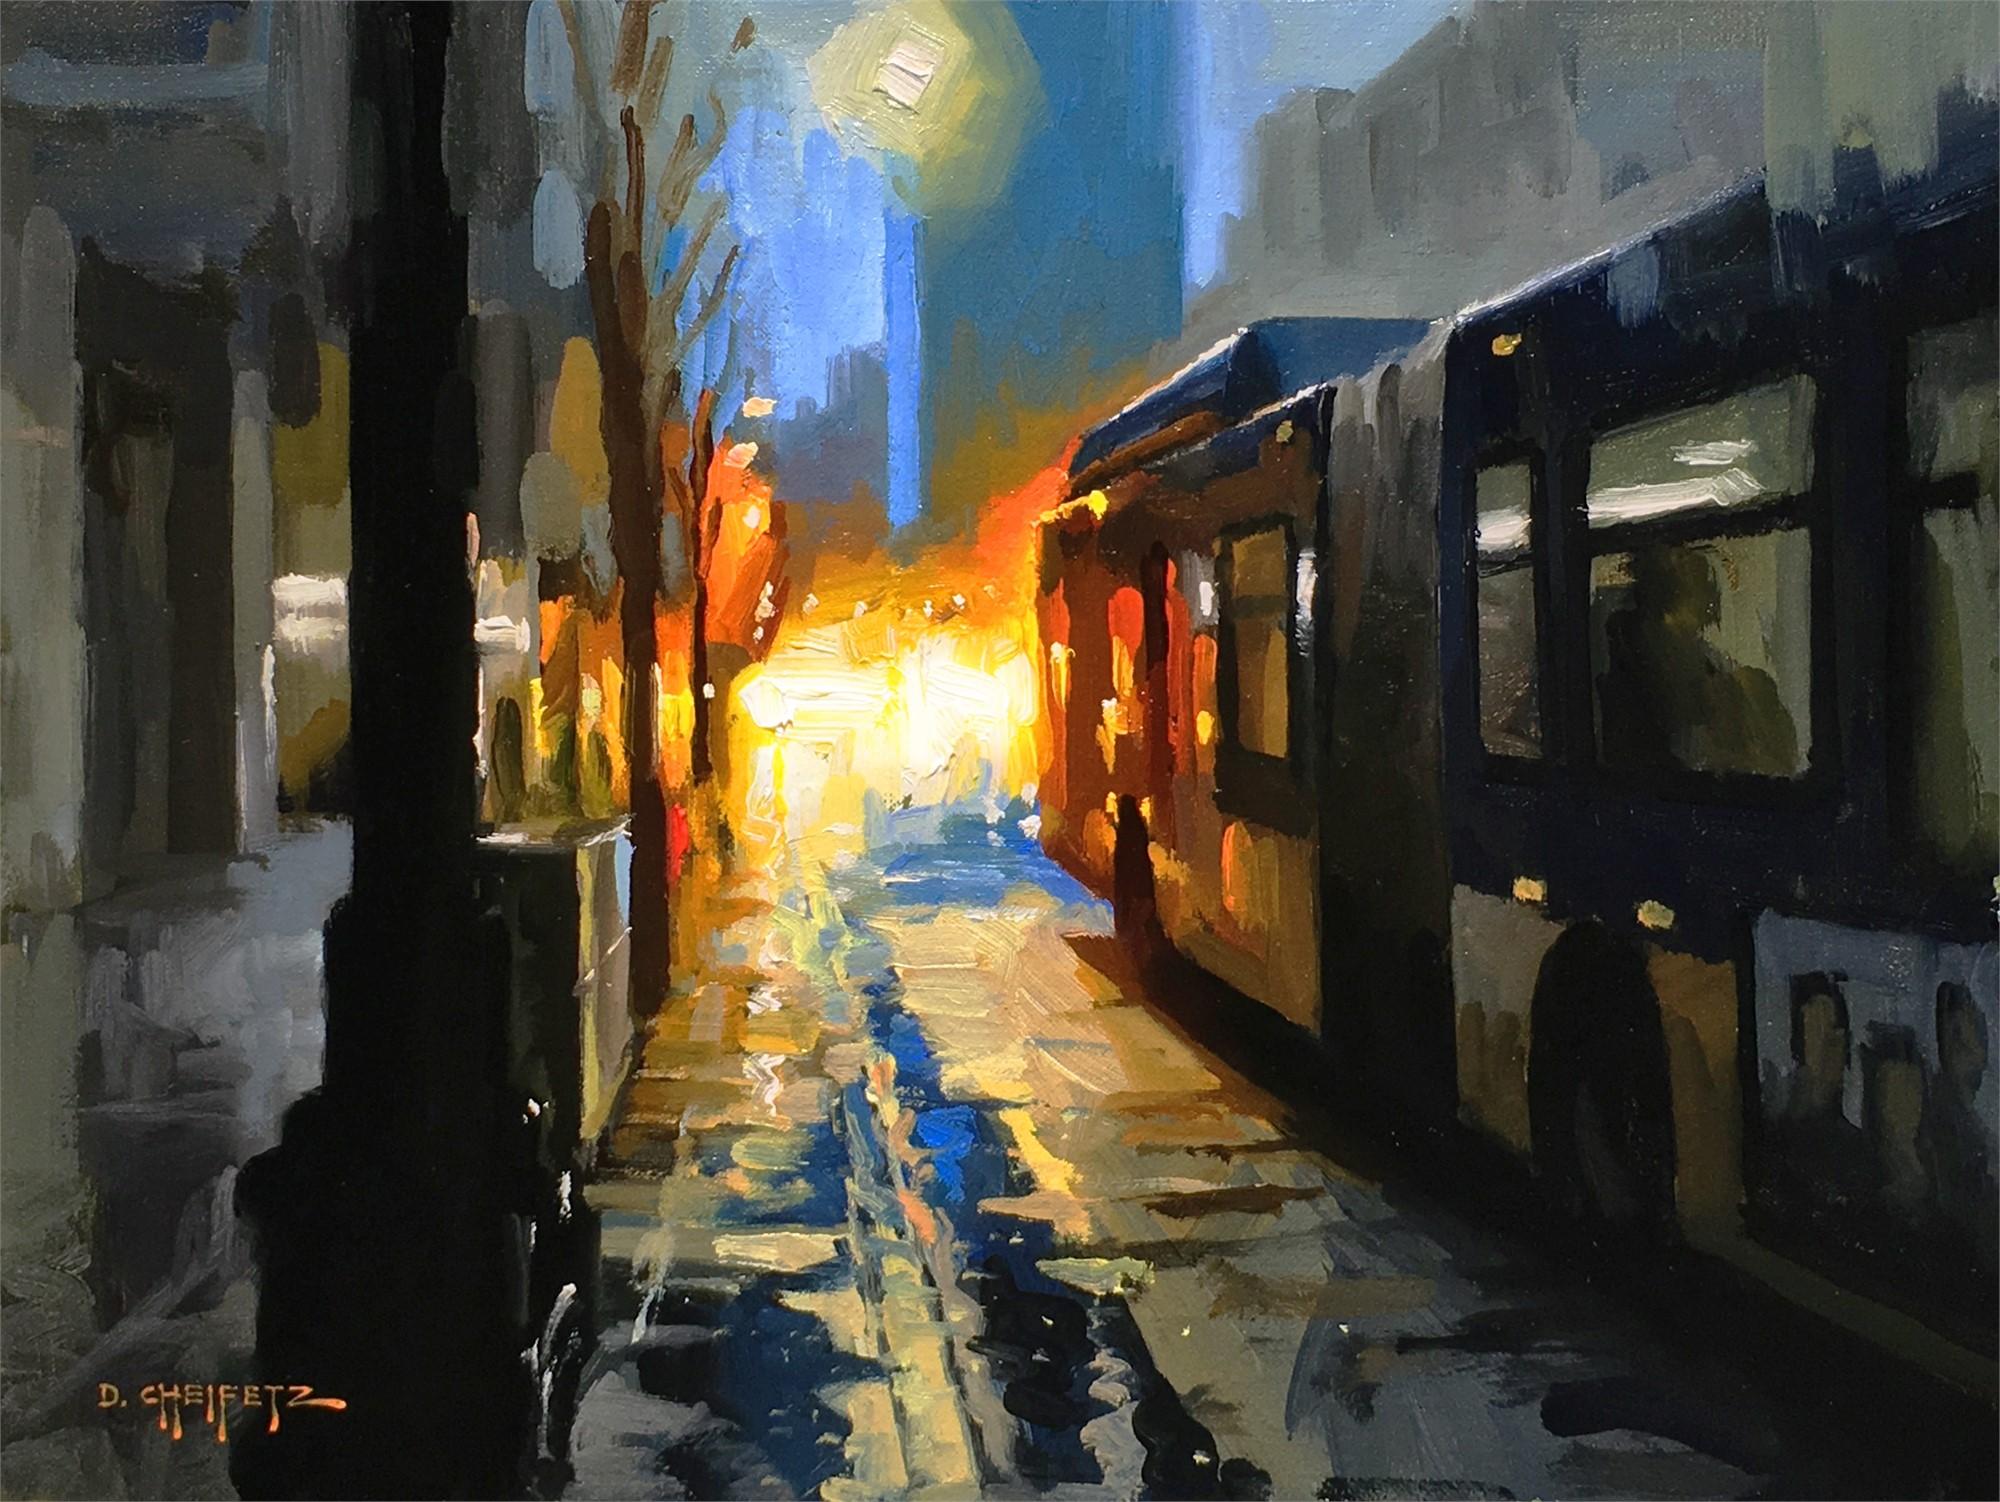 Edge of Light by David Cheifetz